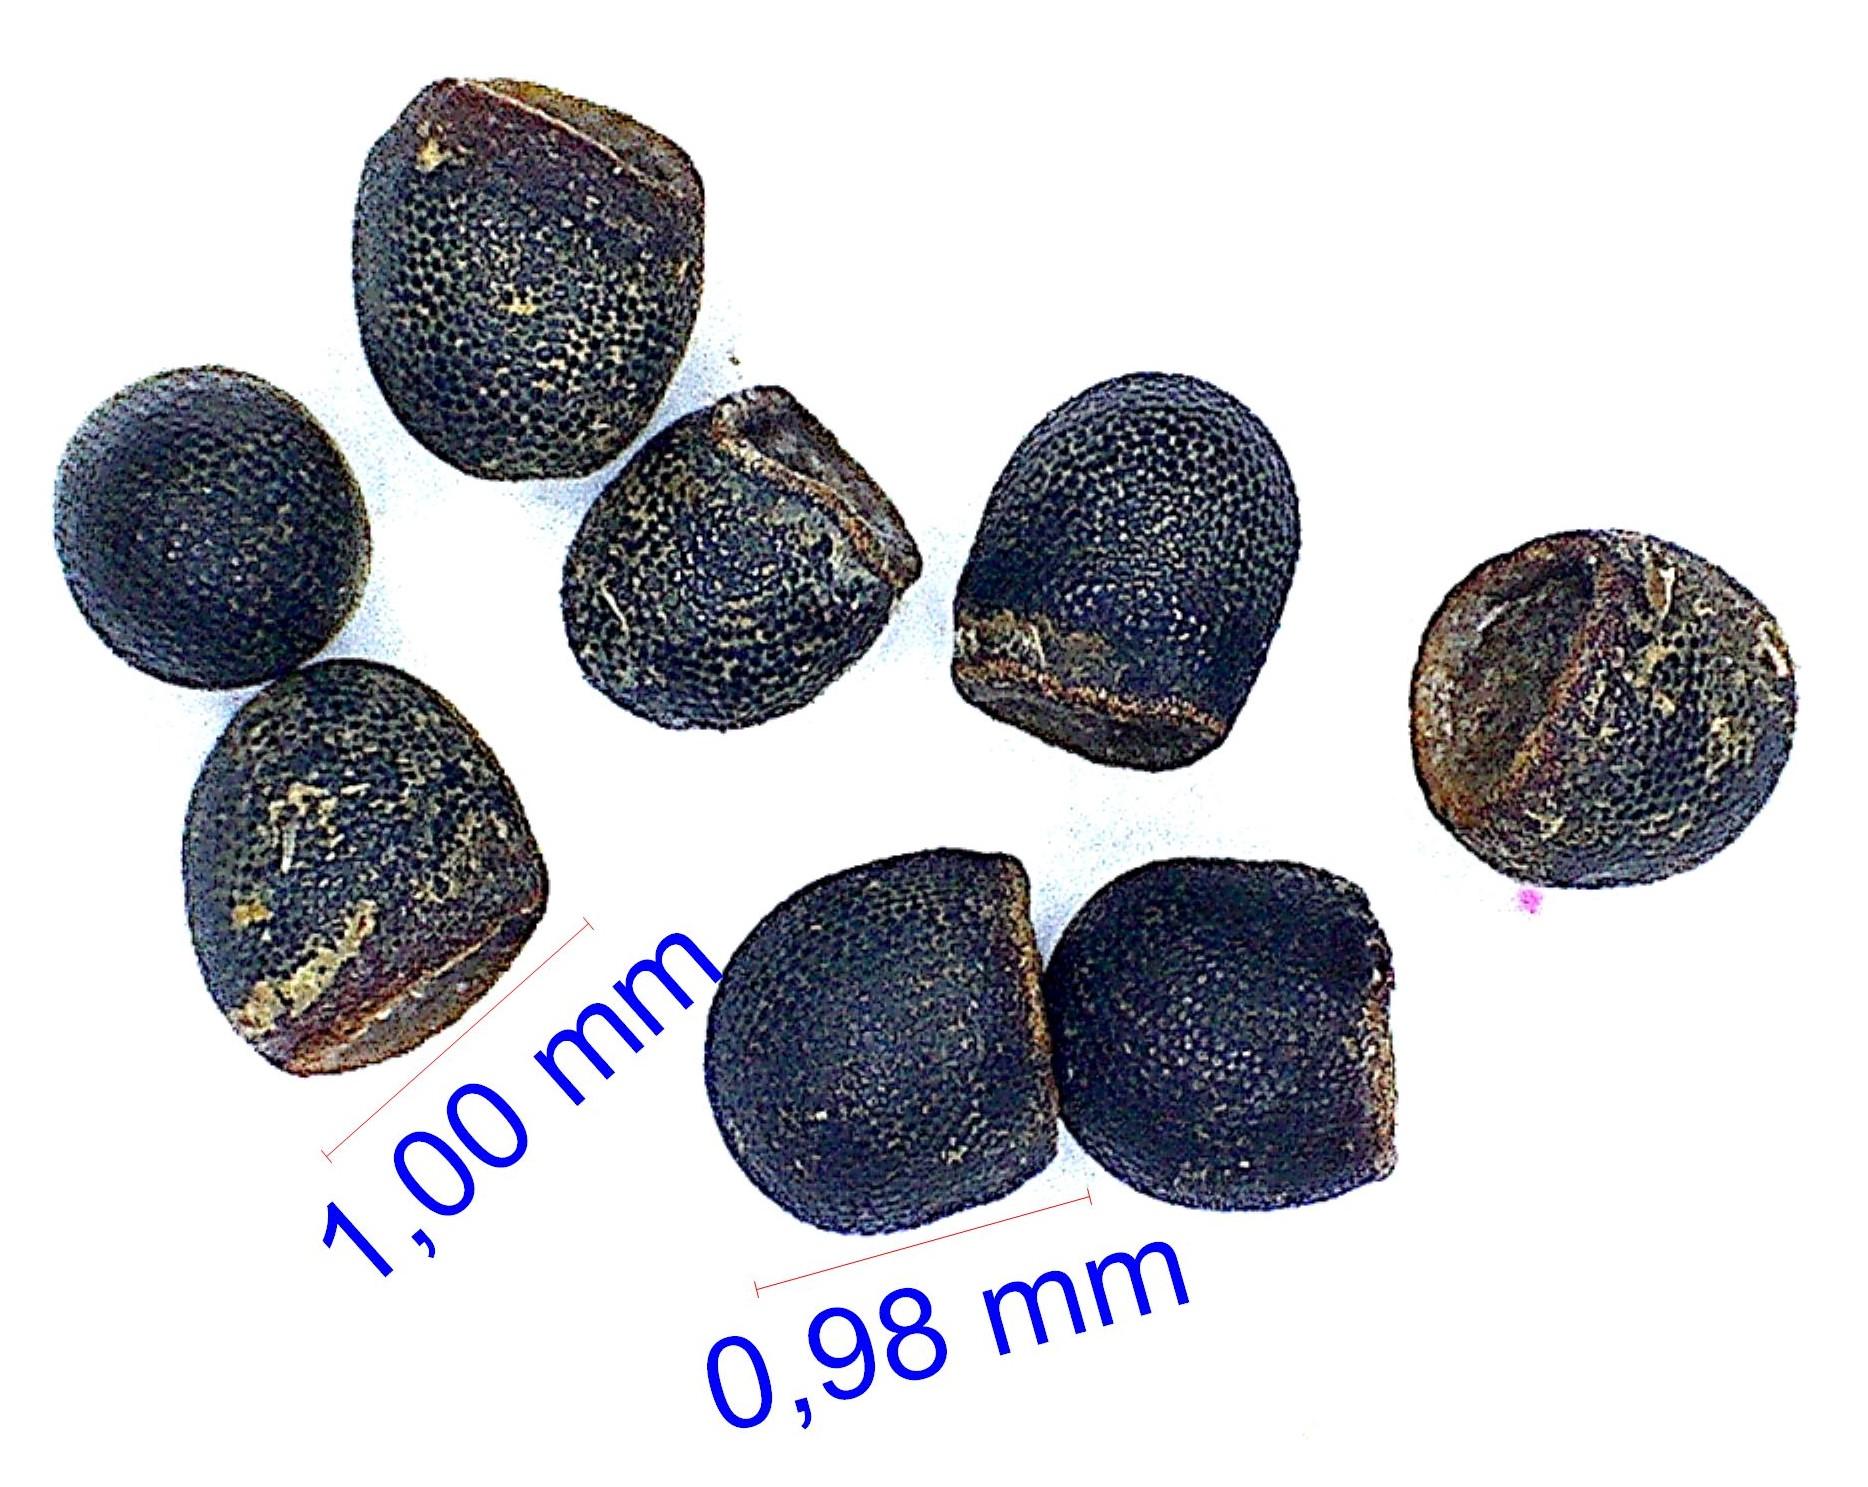 Gymnocalycium neuhuberi © Joël Lodé/cactus-aventures.com